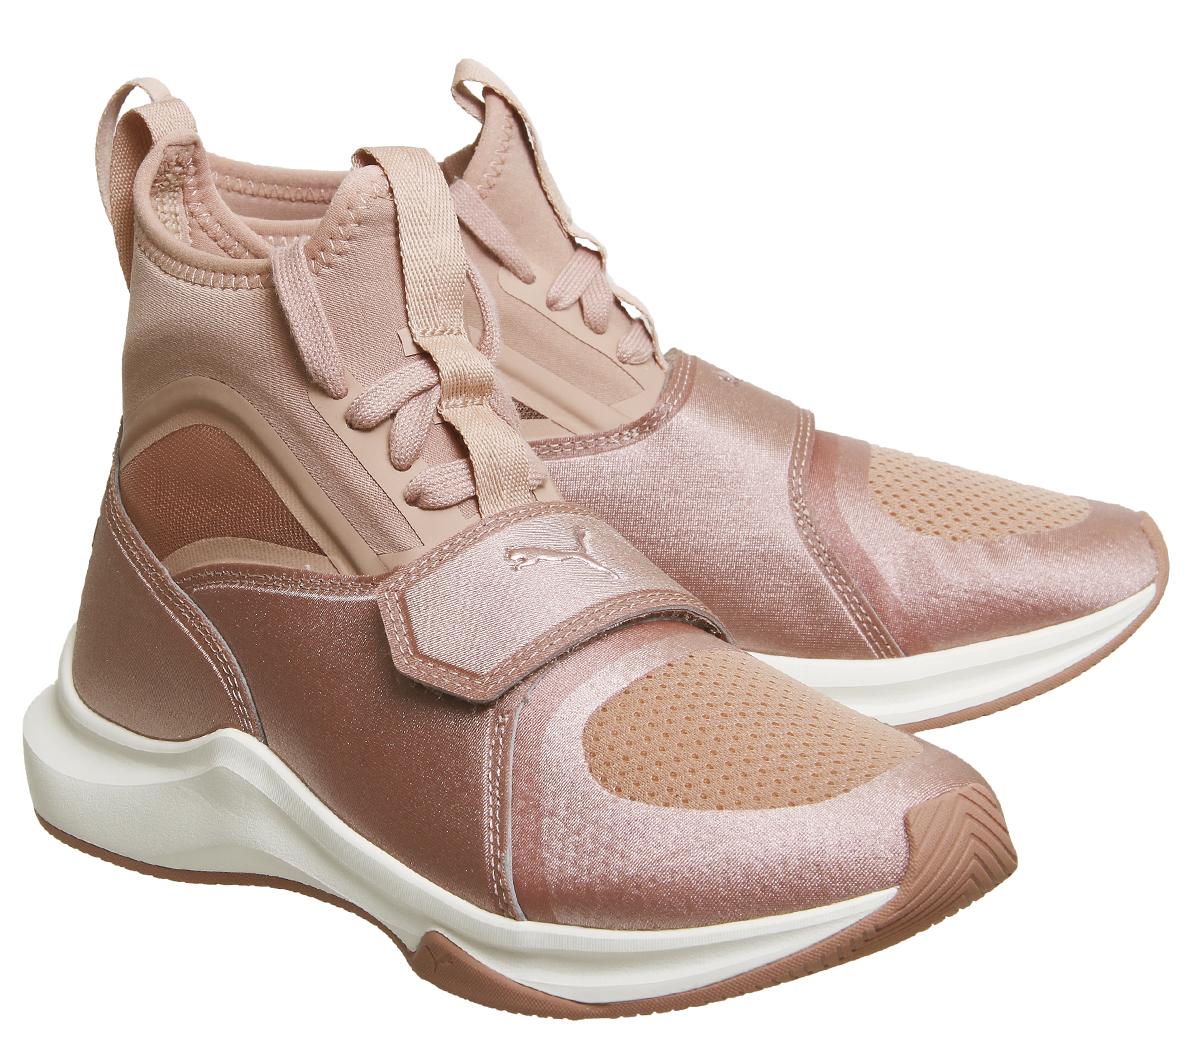 femmes femmes femmes  Puma Phenom Trainers CAMEO BROWN WHISPER  blanc  Trainers  Chaussures 4c75f4